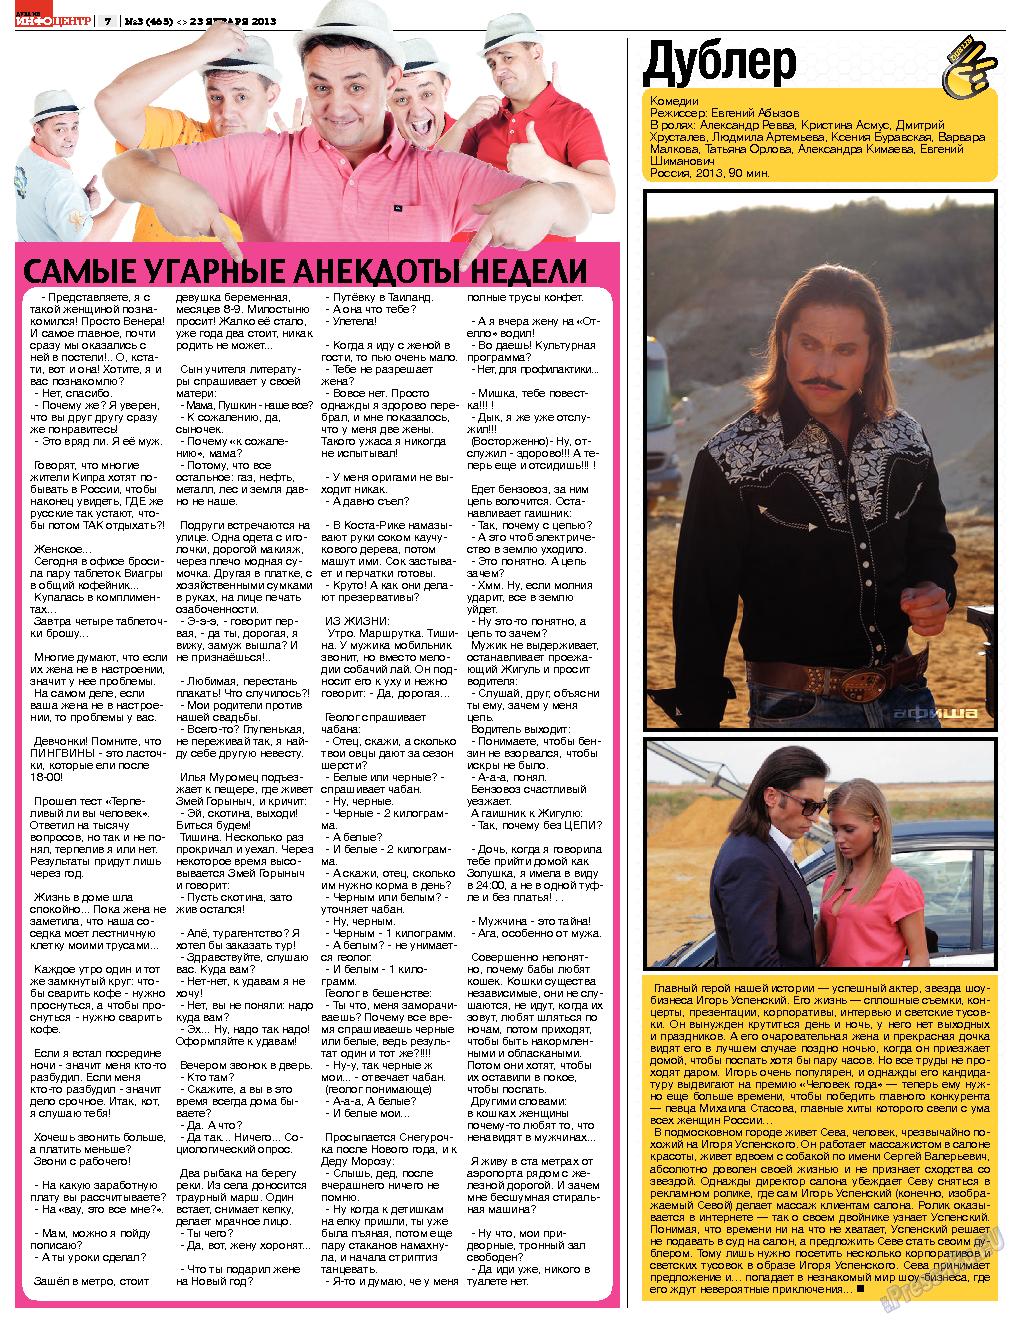 Дублин инфоцентр (газета). 2013 год, номер 3, стр. 7